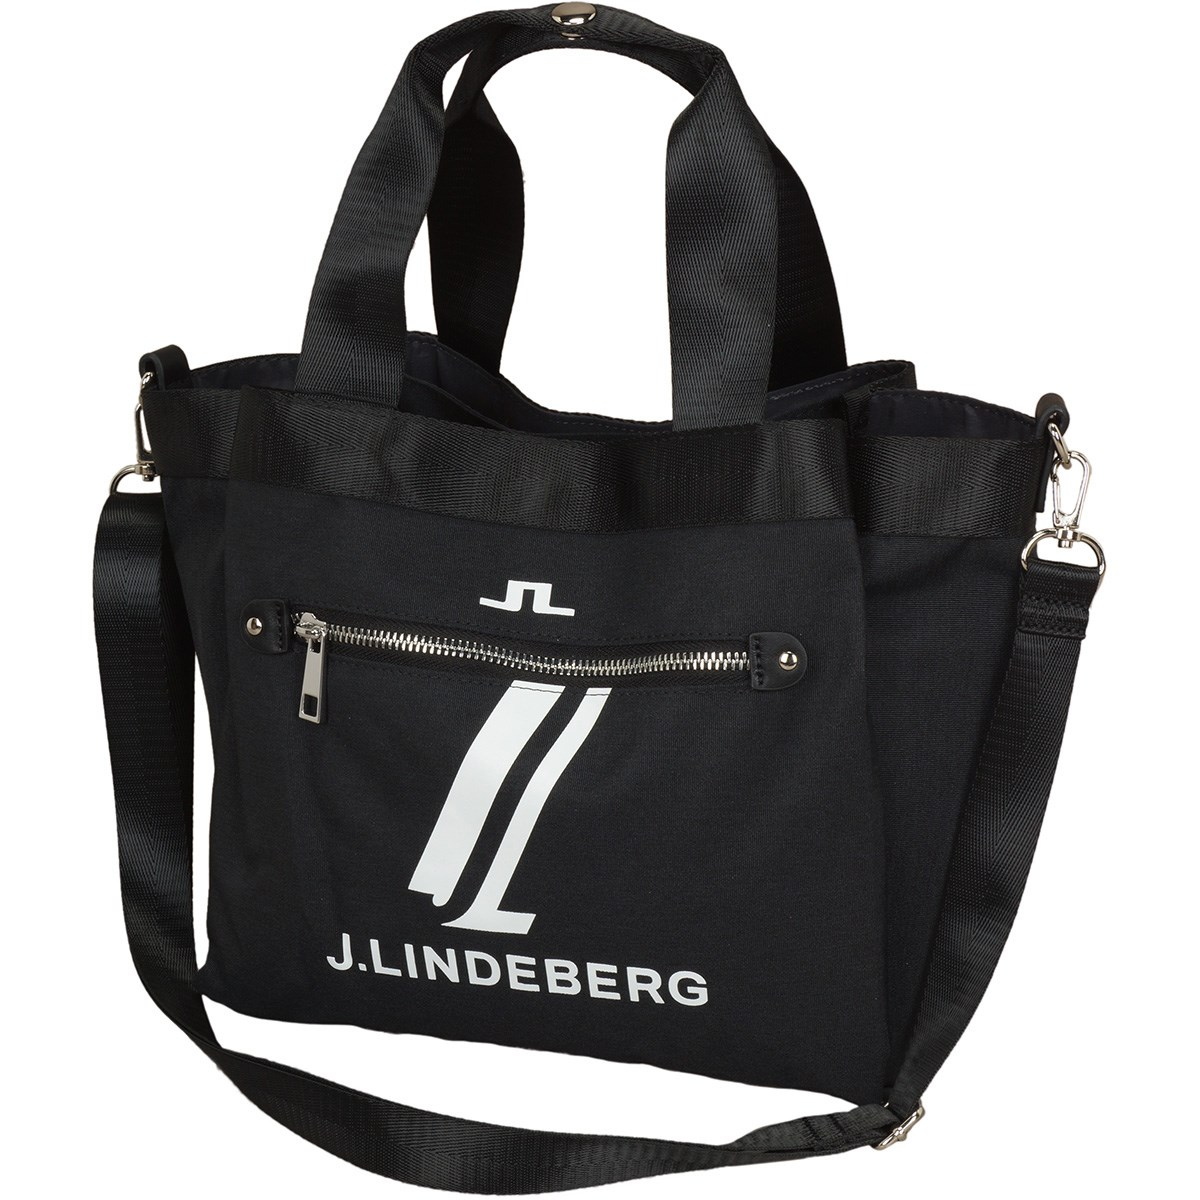 J.リンドバーグ J.LINDEBERG カートバッグ ブラック 019